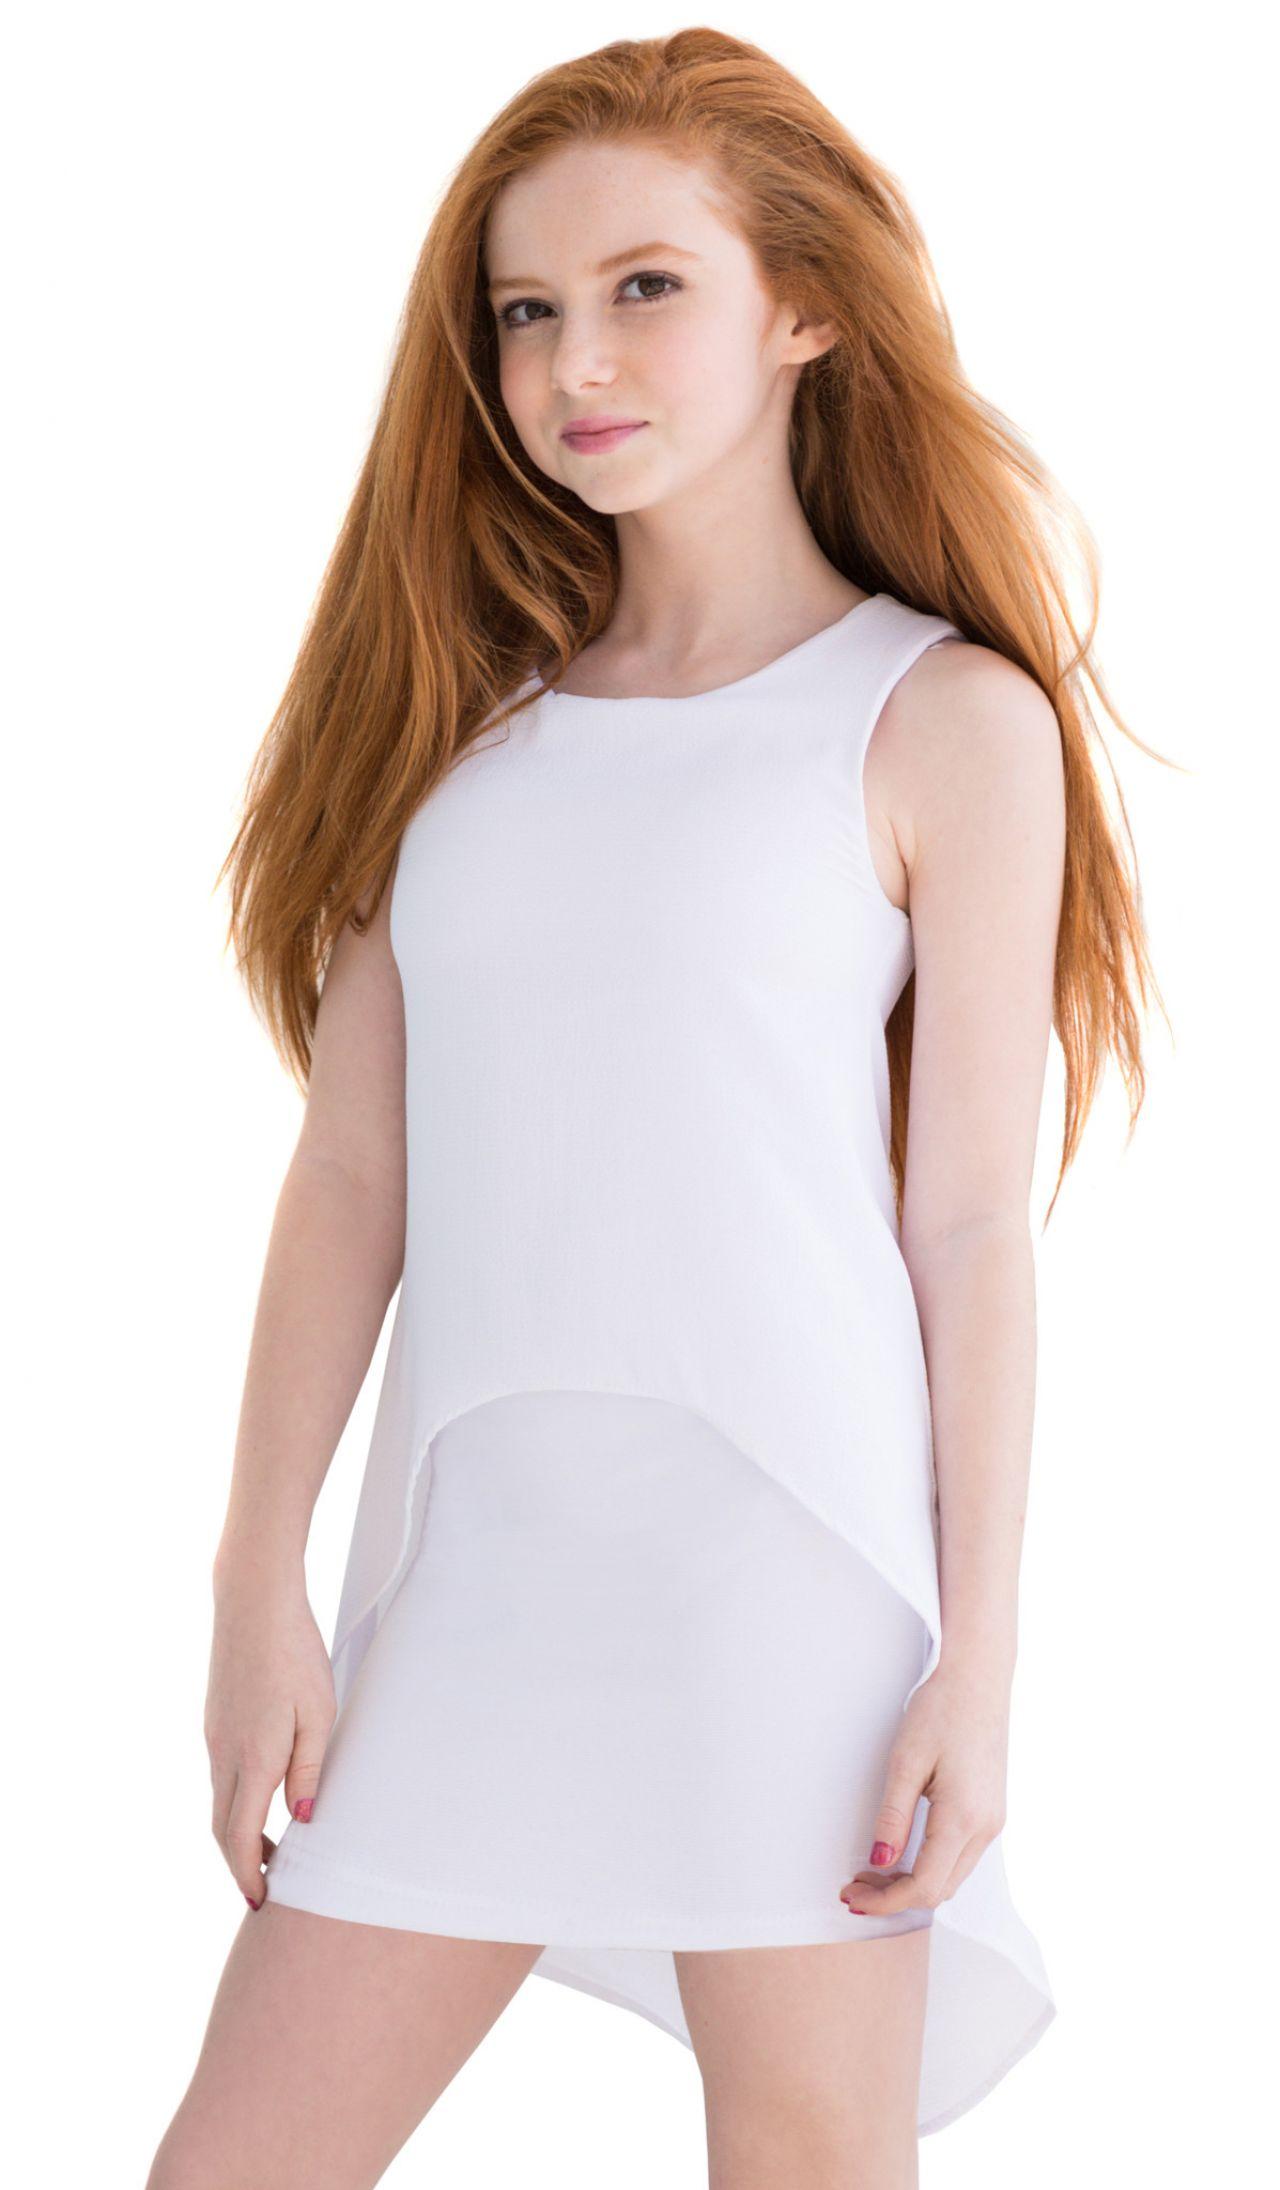 Francesca Capaldi Age 2016